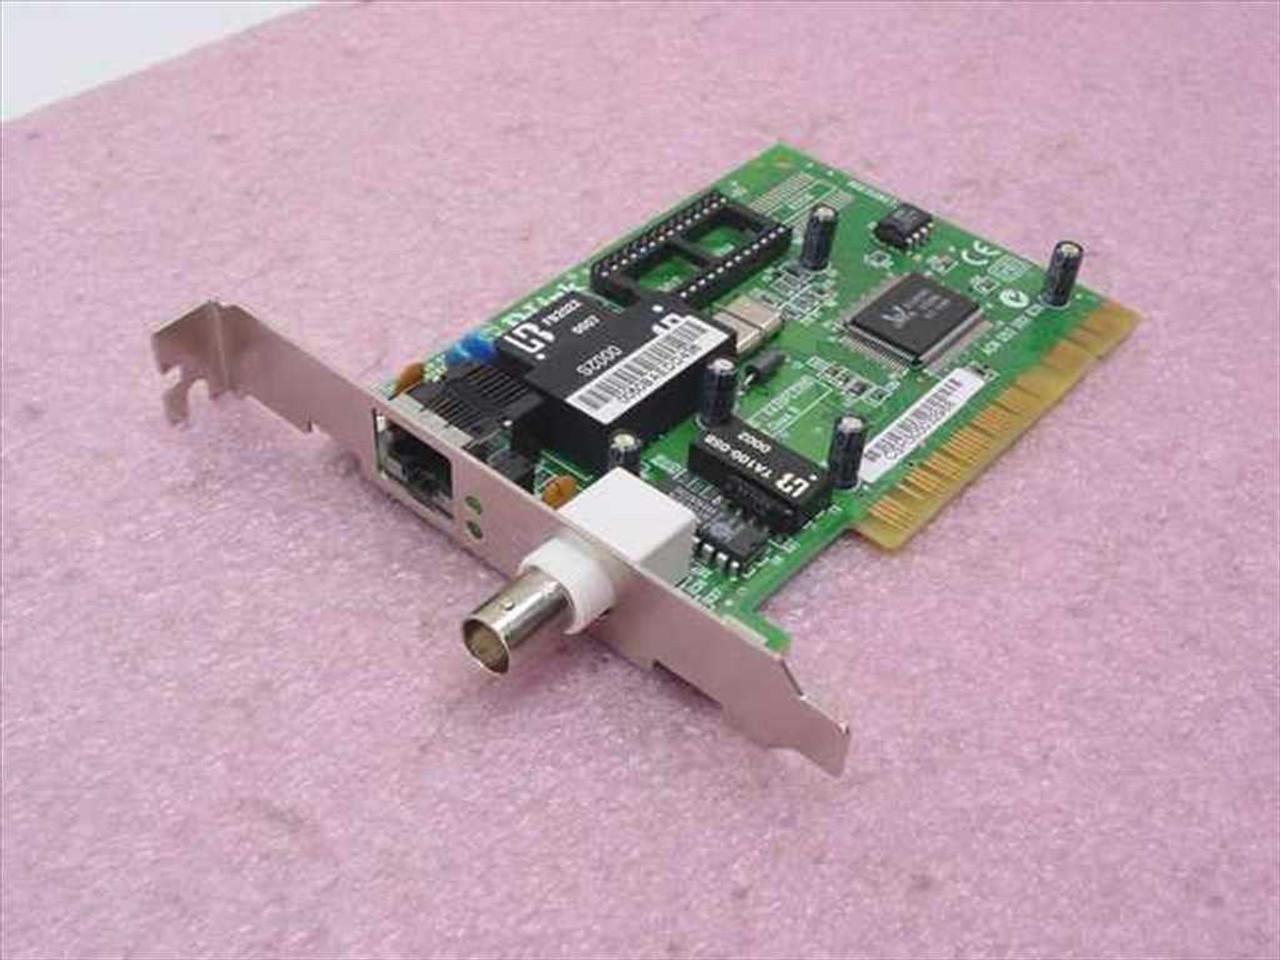 DLINK DE-528 WINDOWS XP DRIVER